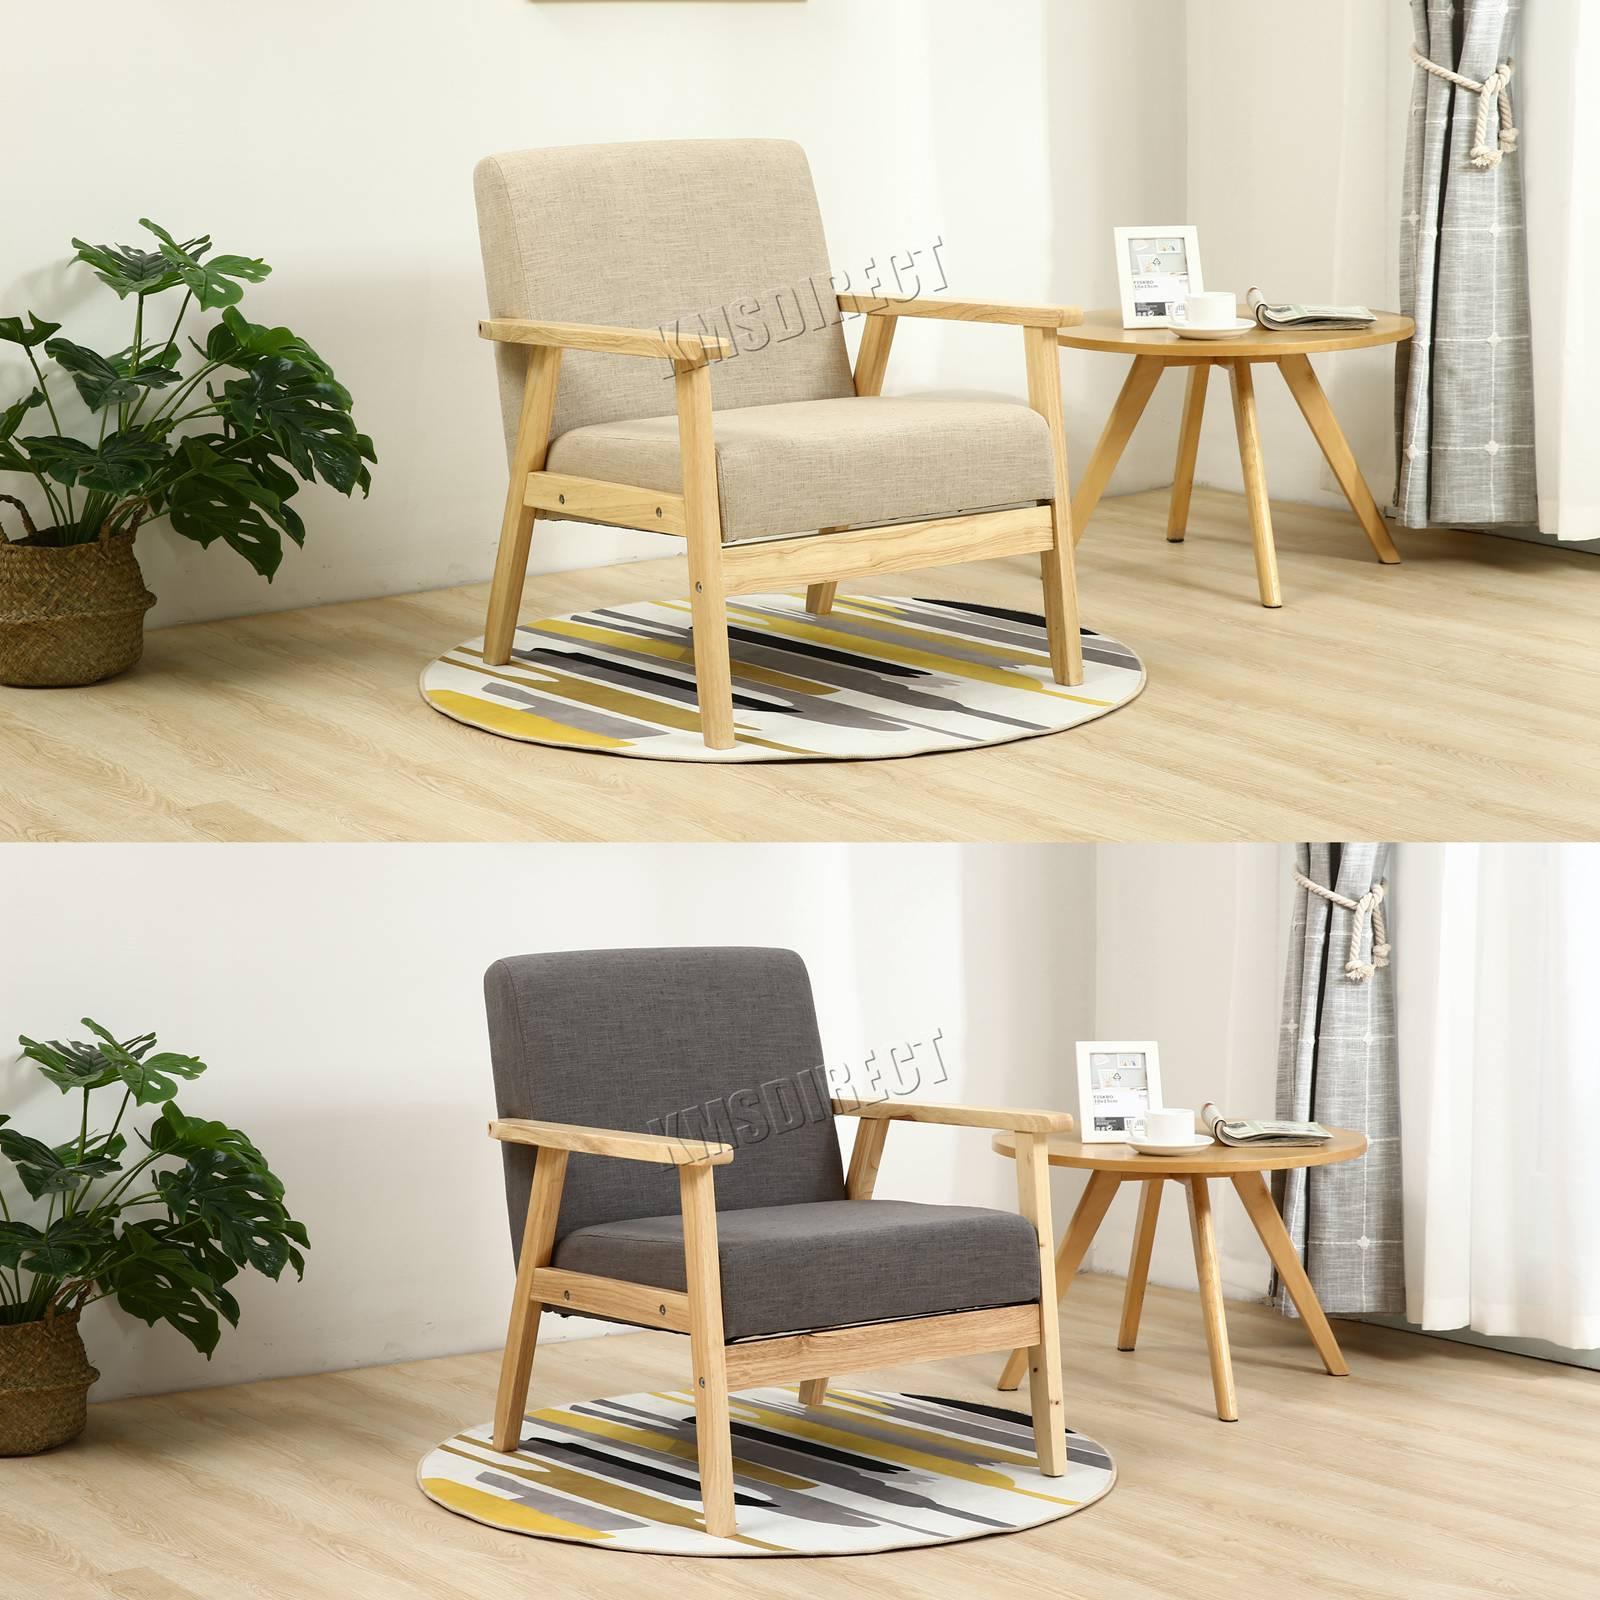 Awesome Single Chair Sofa